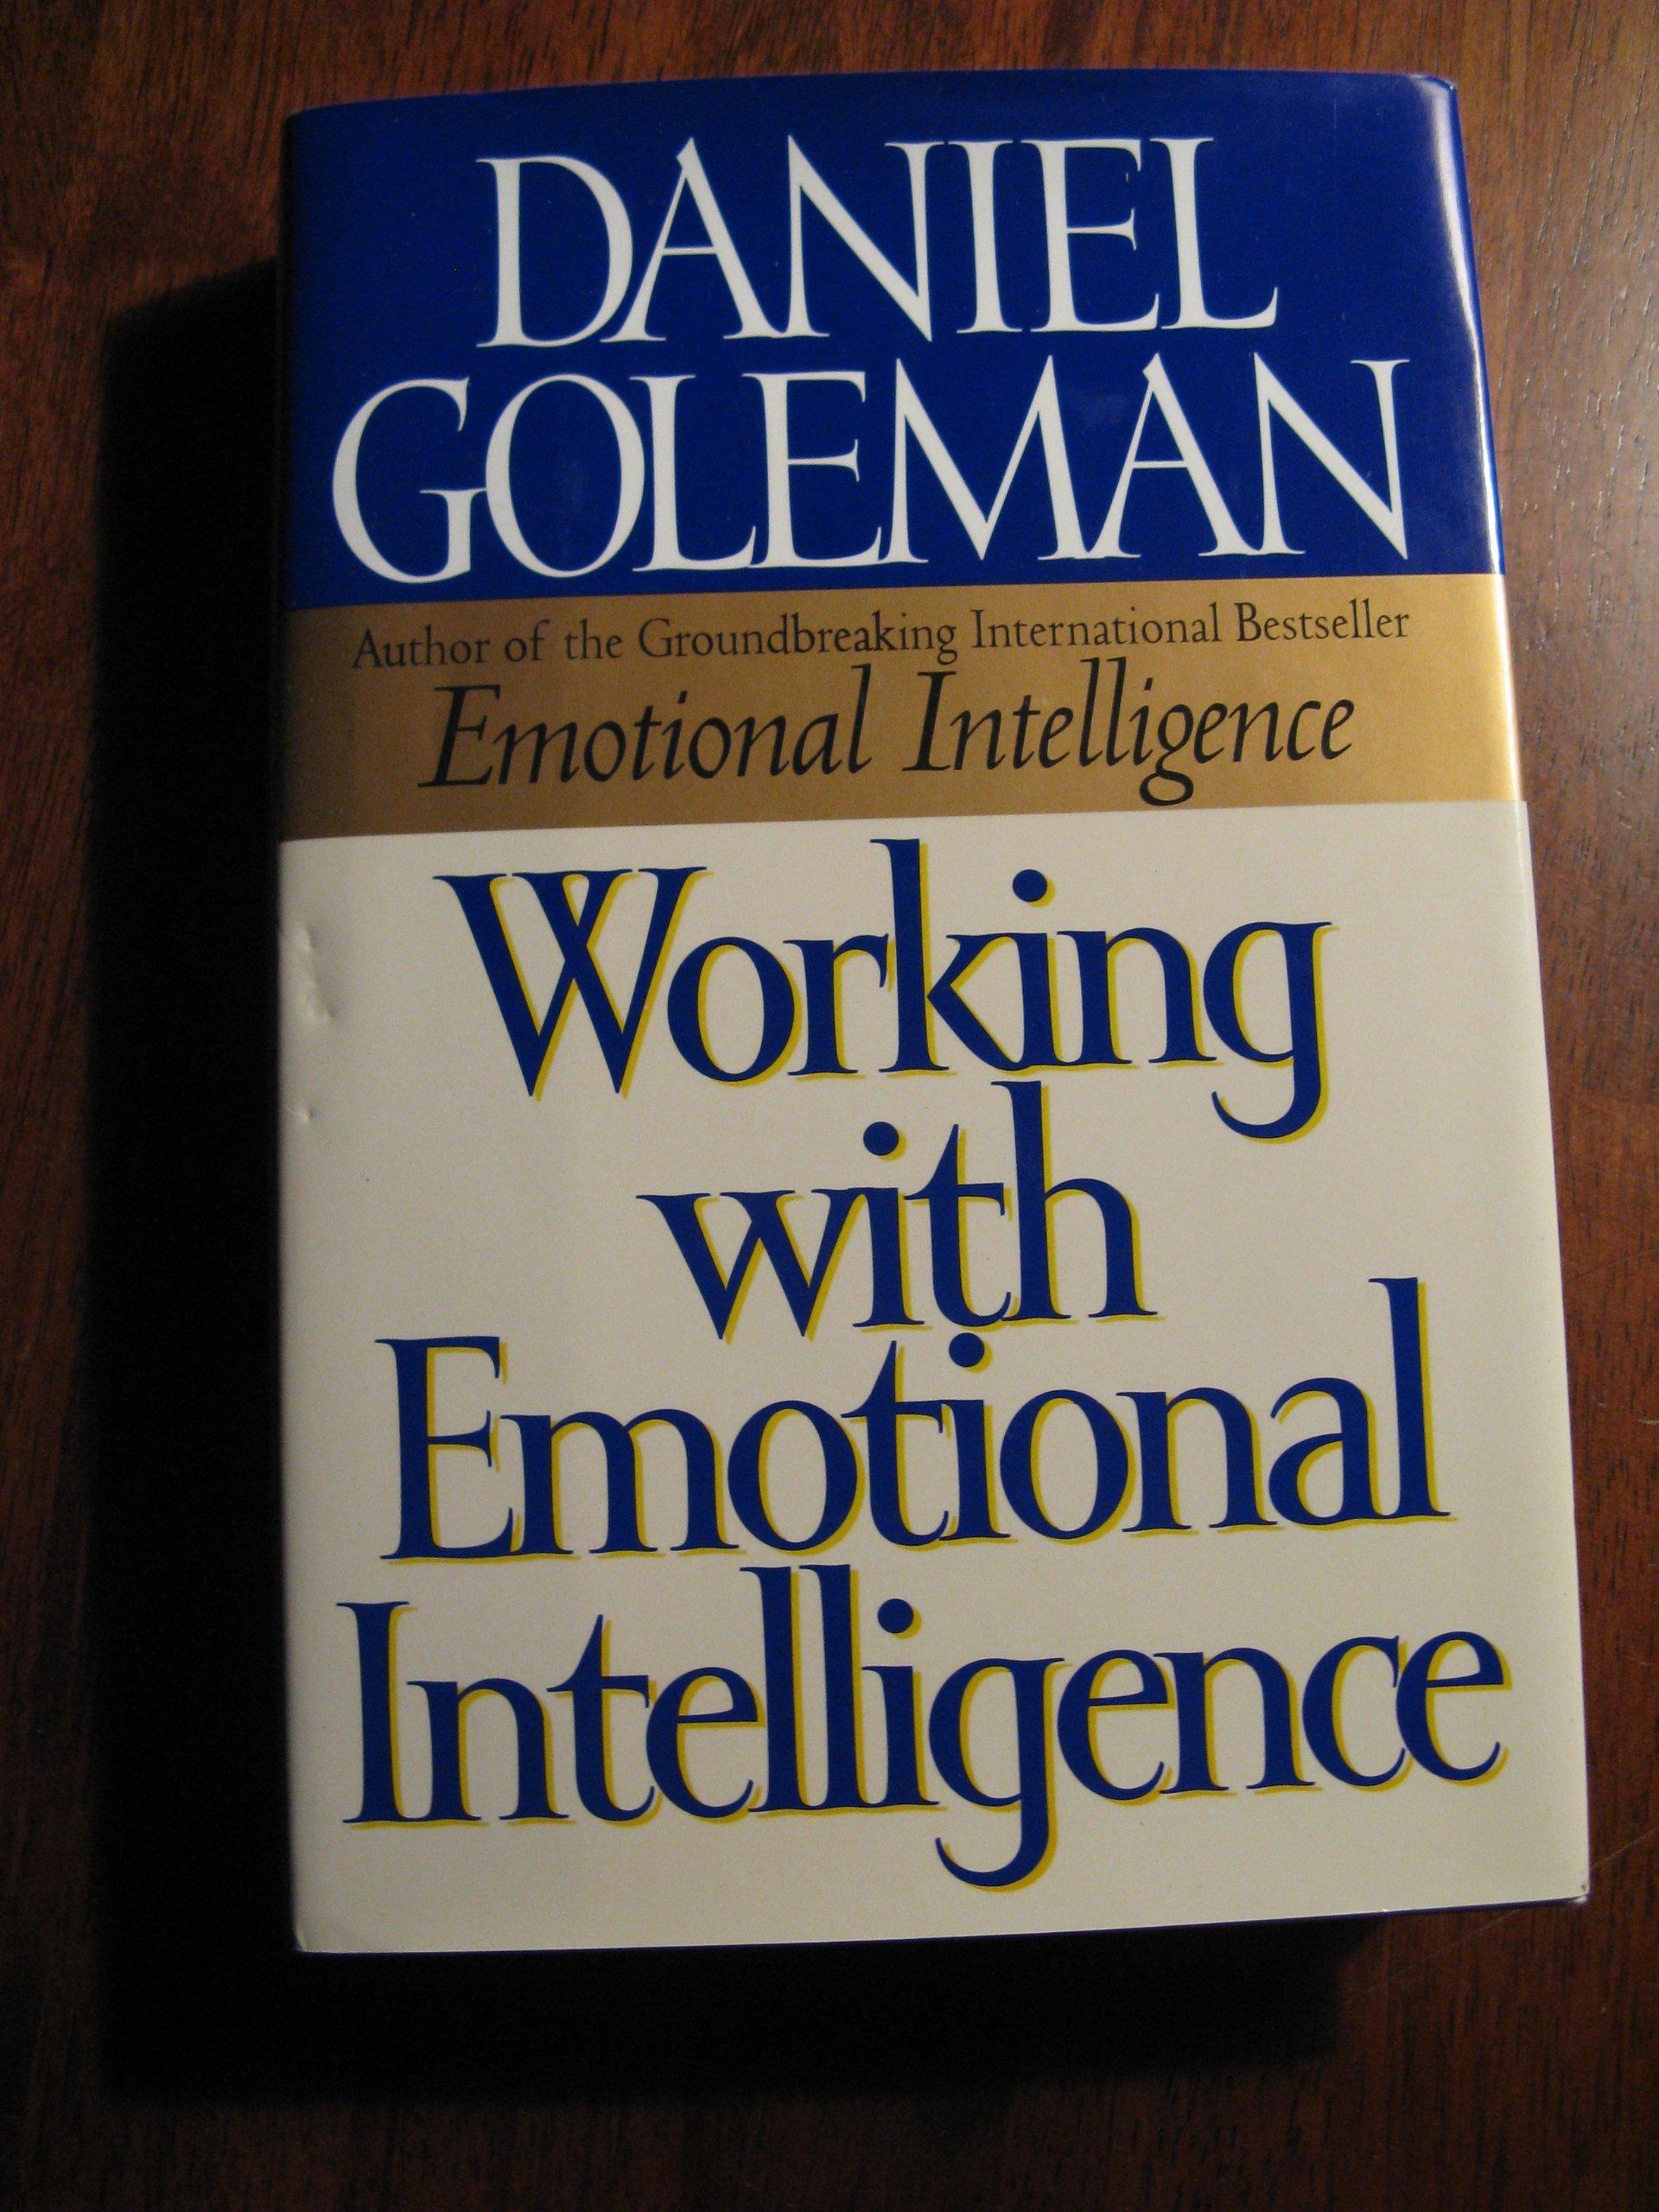 Working with Emotional Intelligence: Daniel Goleman